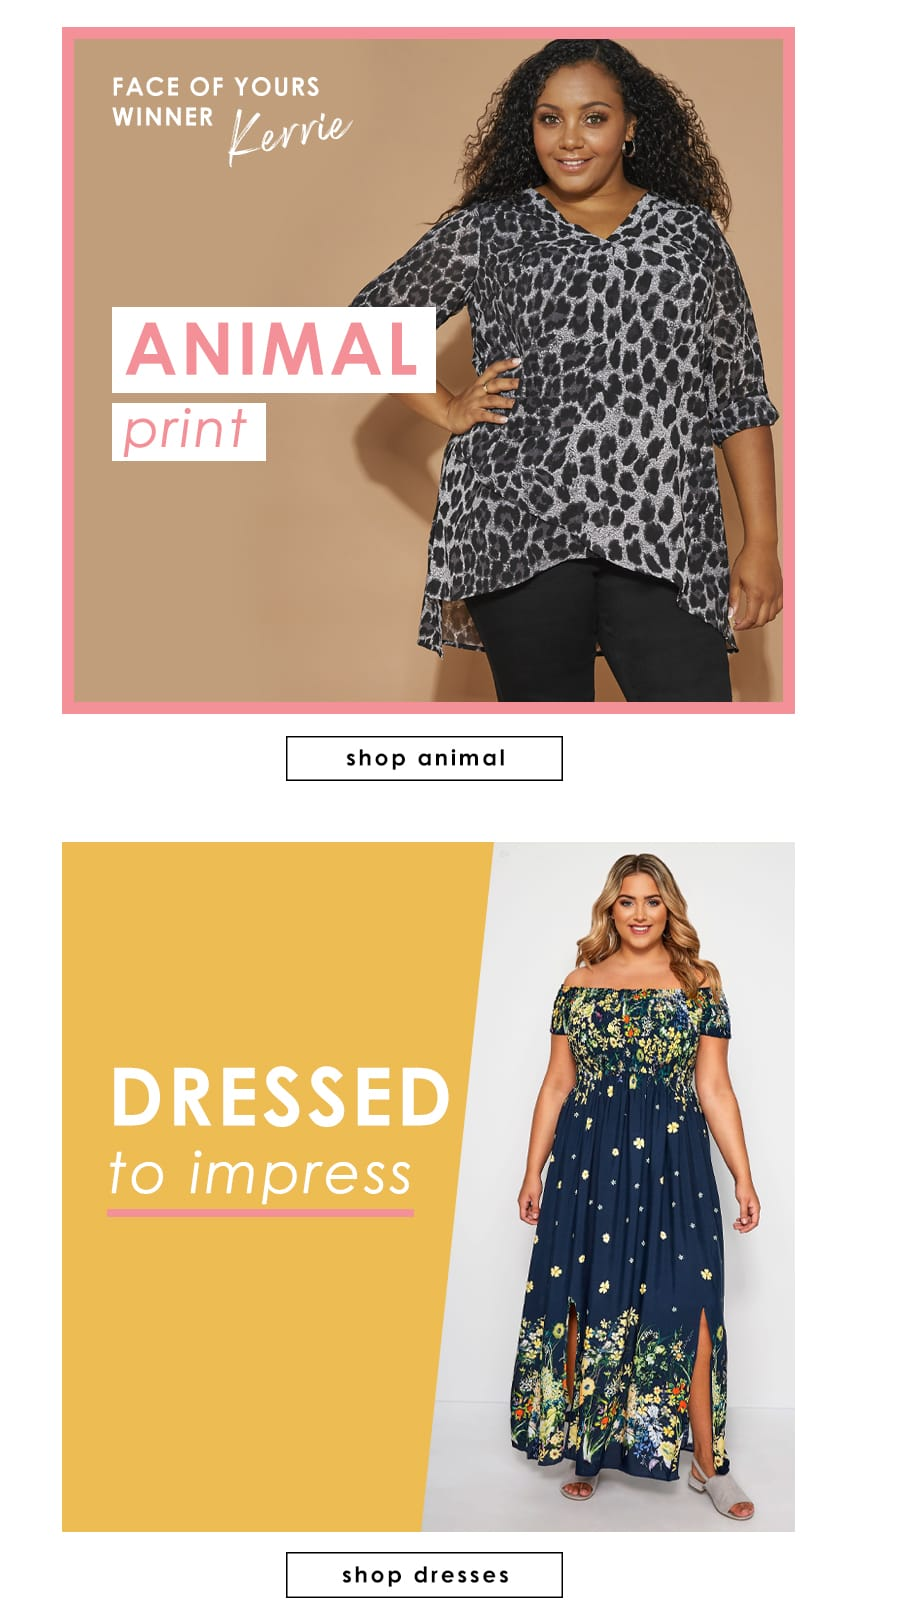 Animal & Dresses